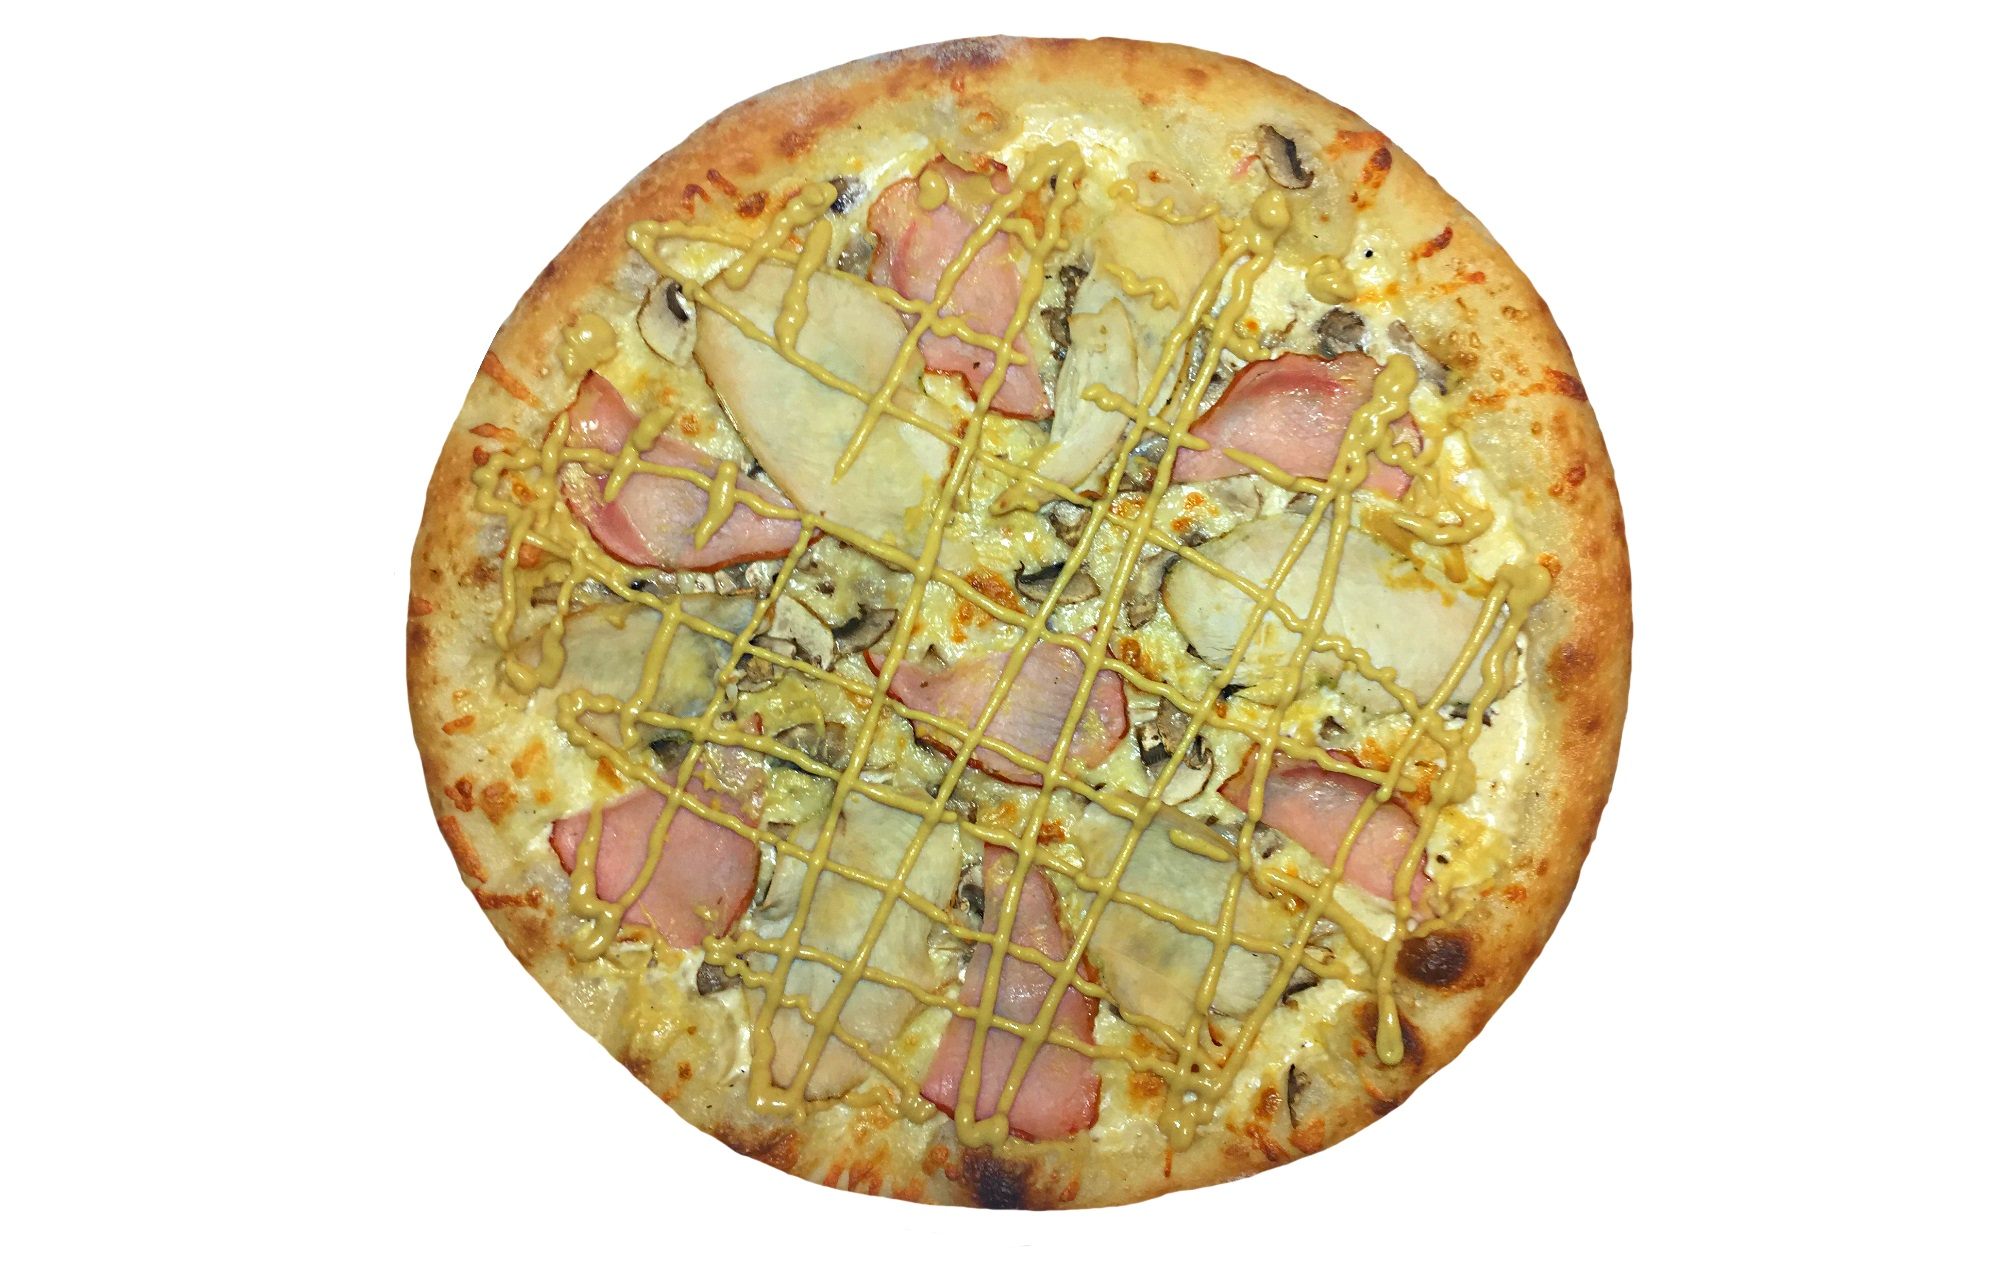 Доставка пиццы в Минске urbanfood.by - Пицца Канзас-Чикен